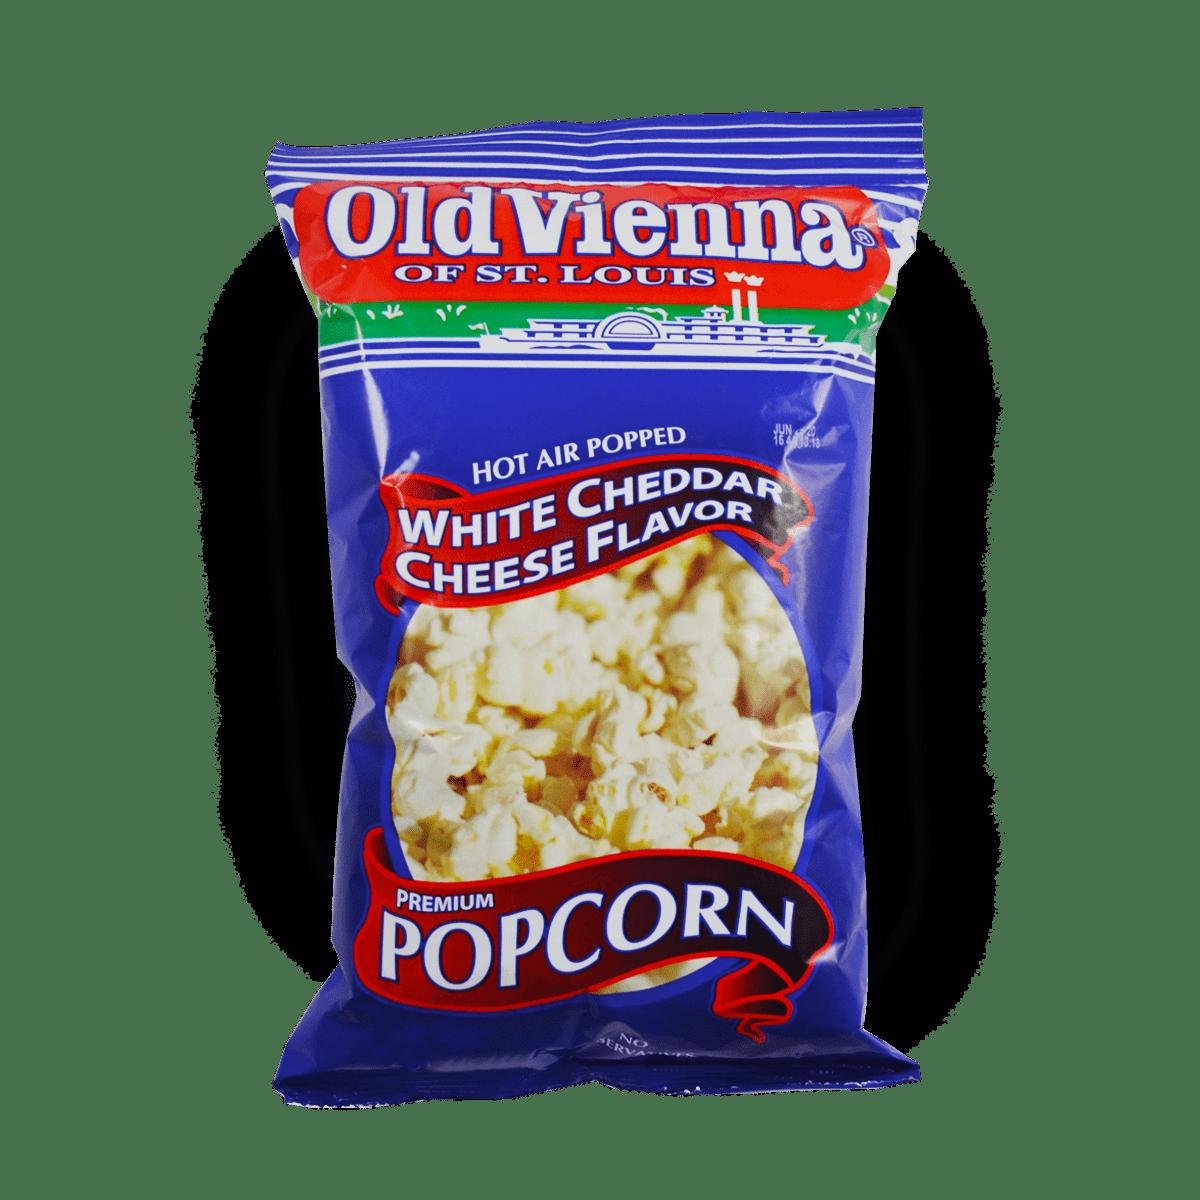 Old Vienna White Cheddar Cheese flavored popcorn